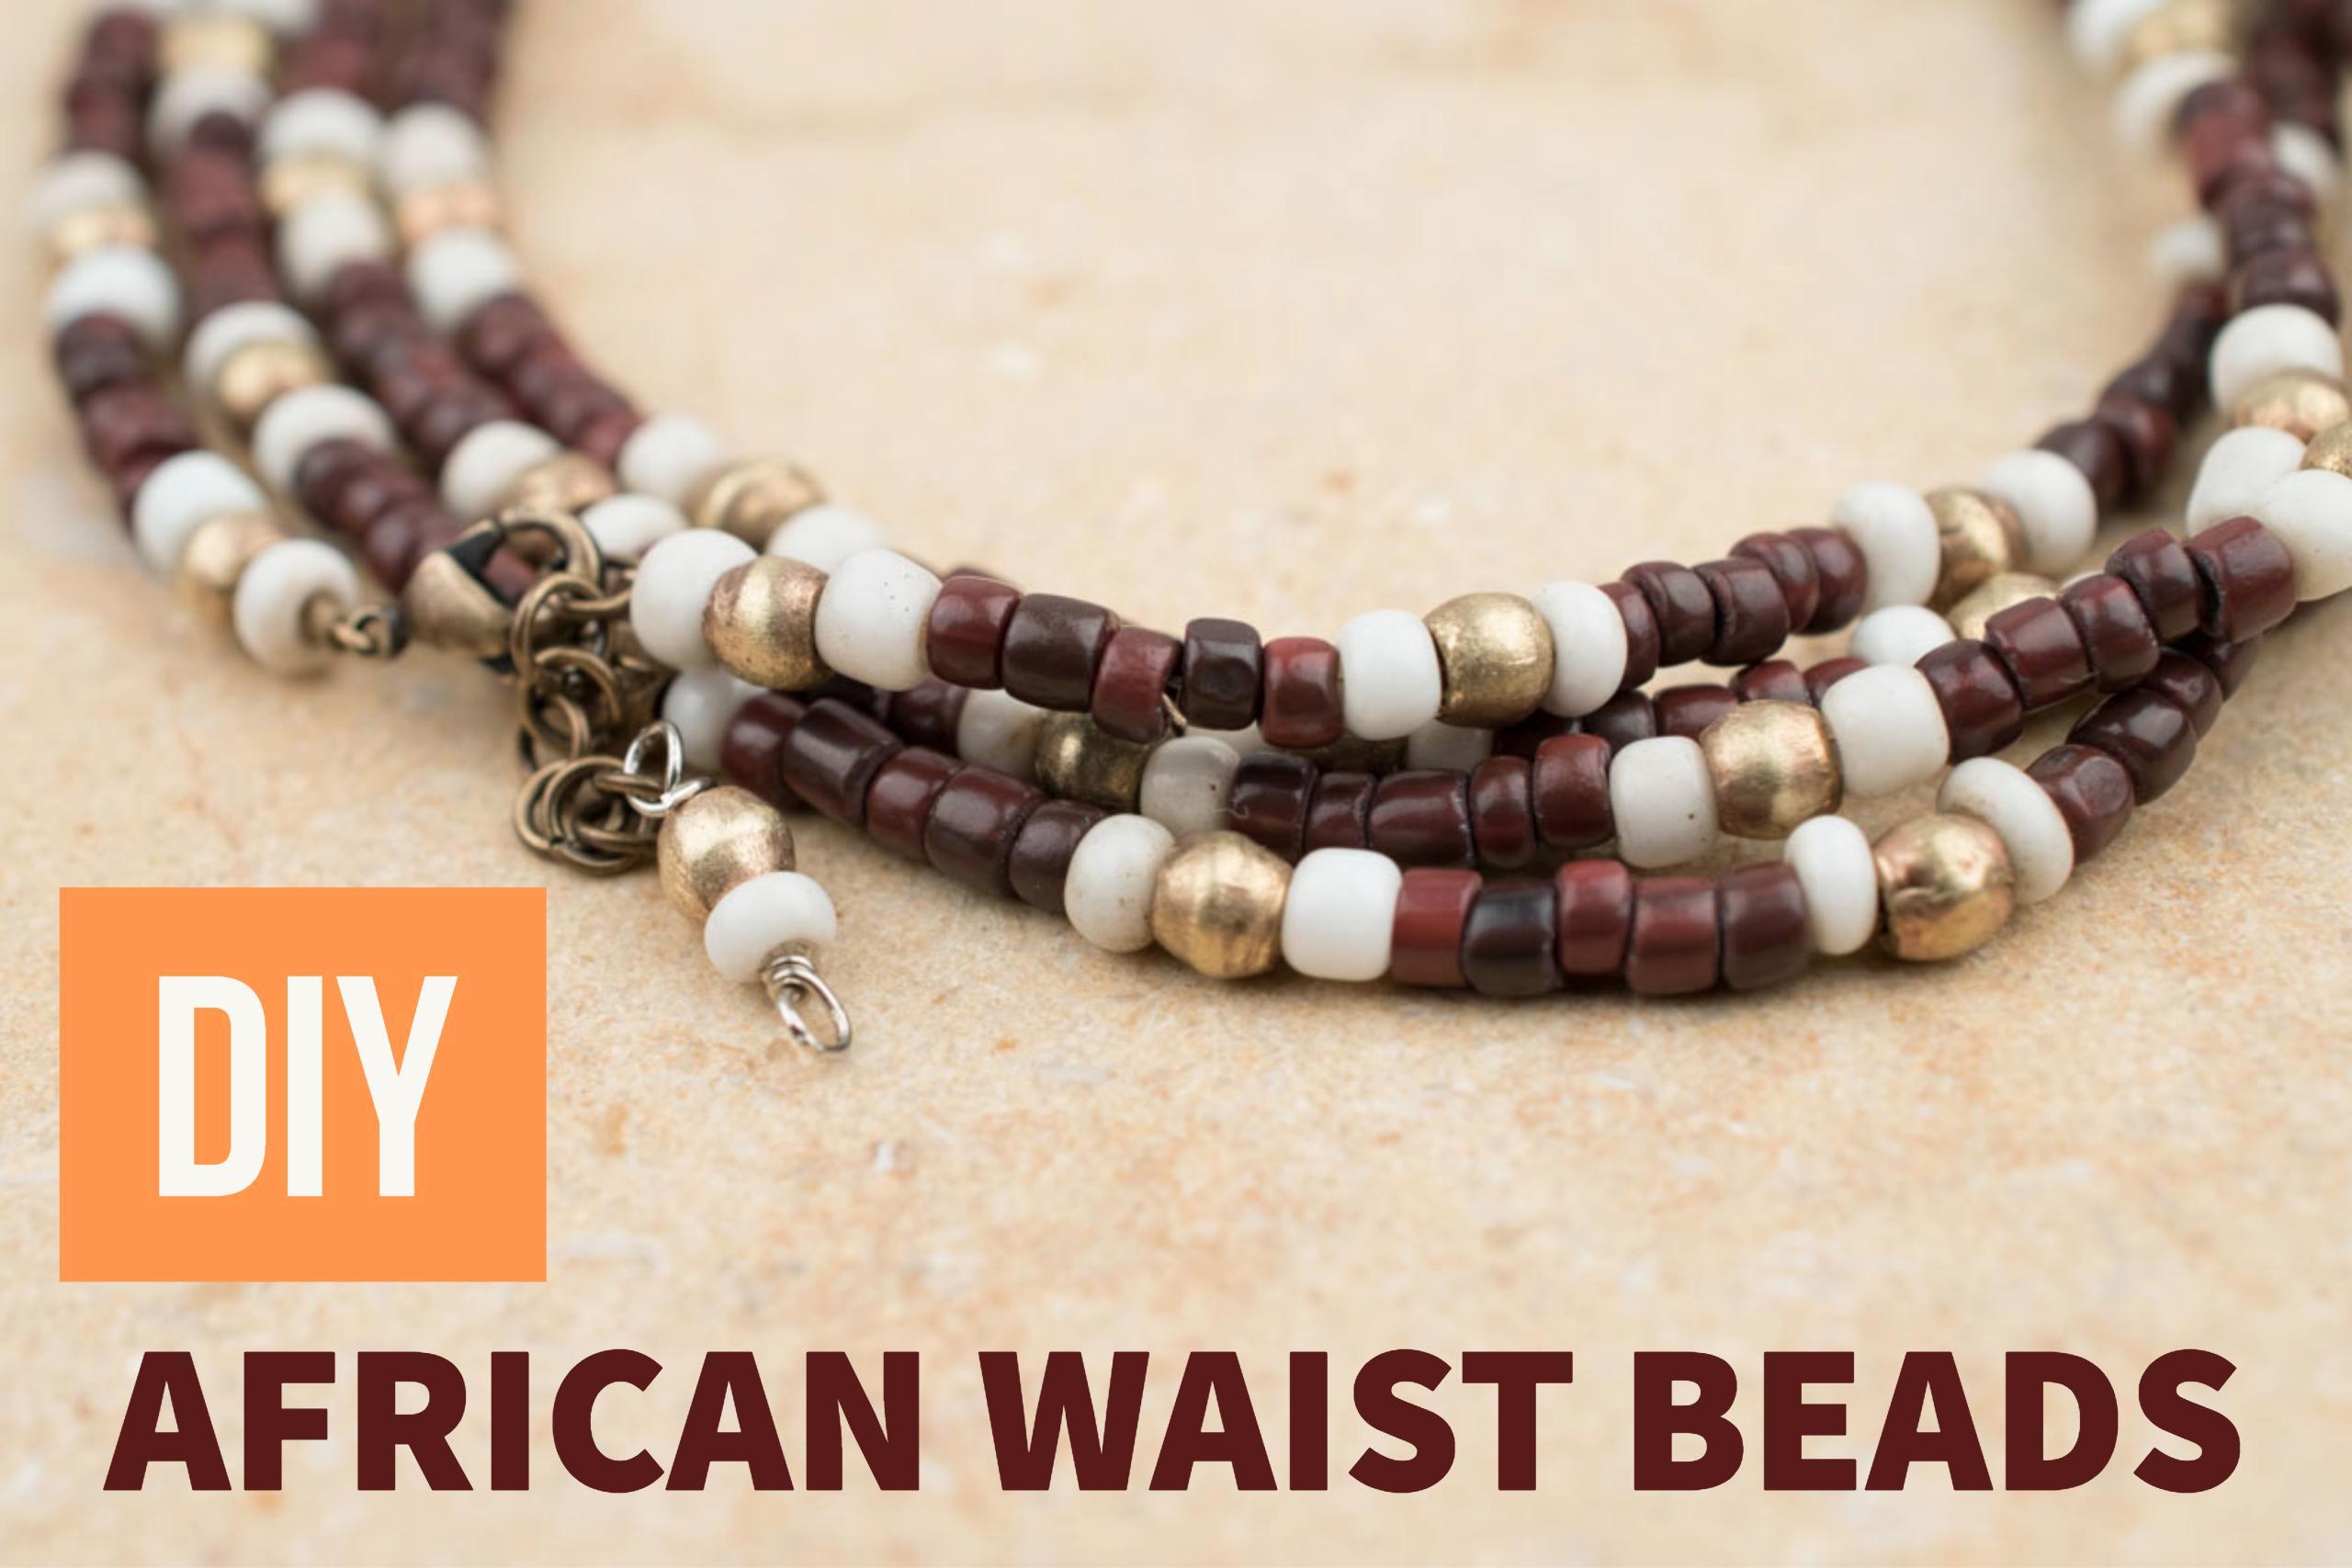 How to Make African Waist Beads